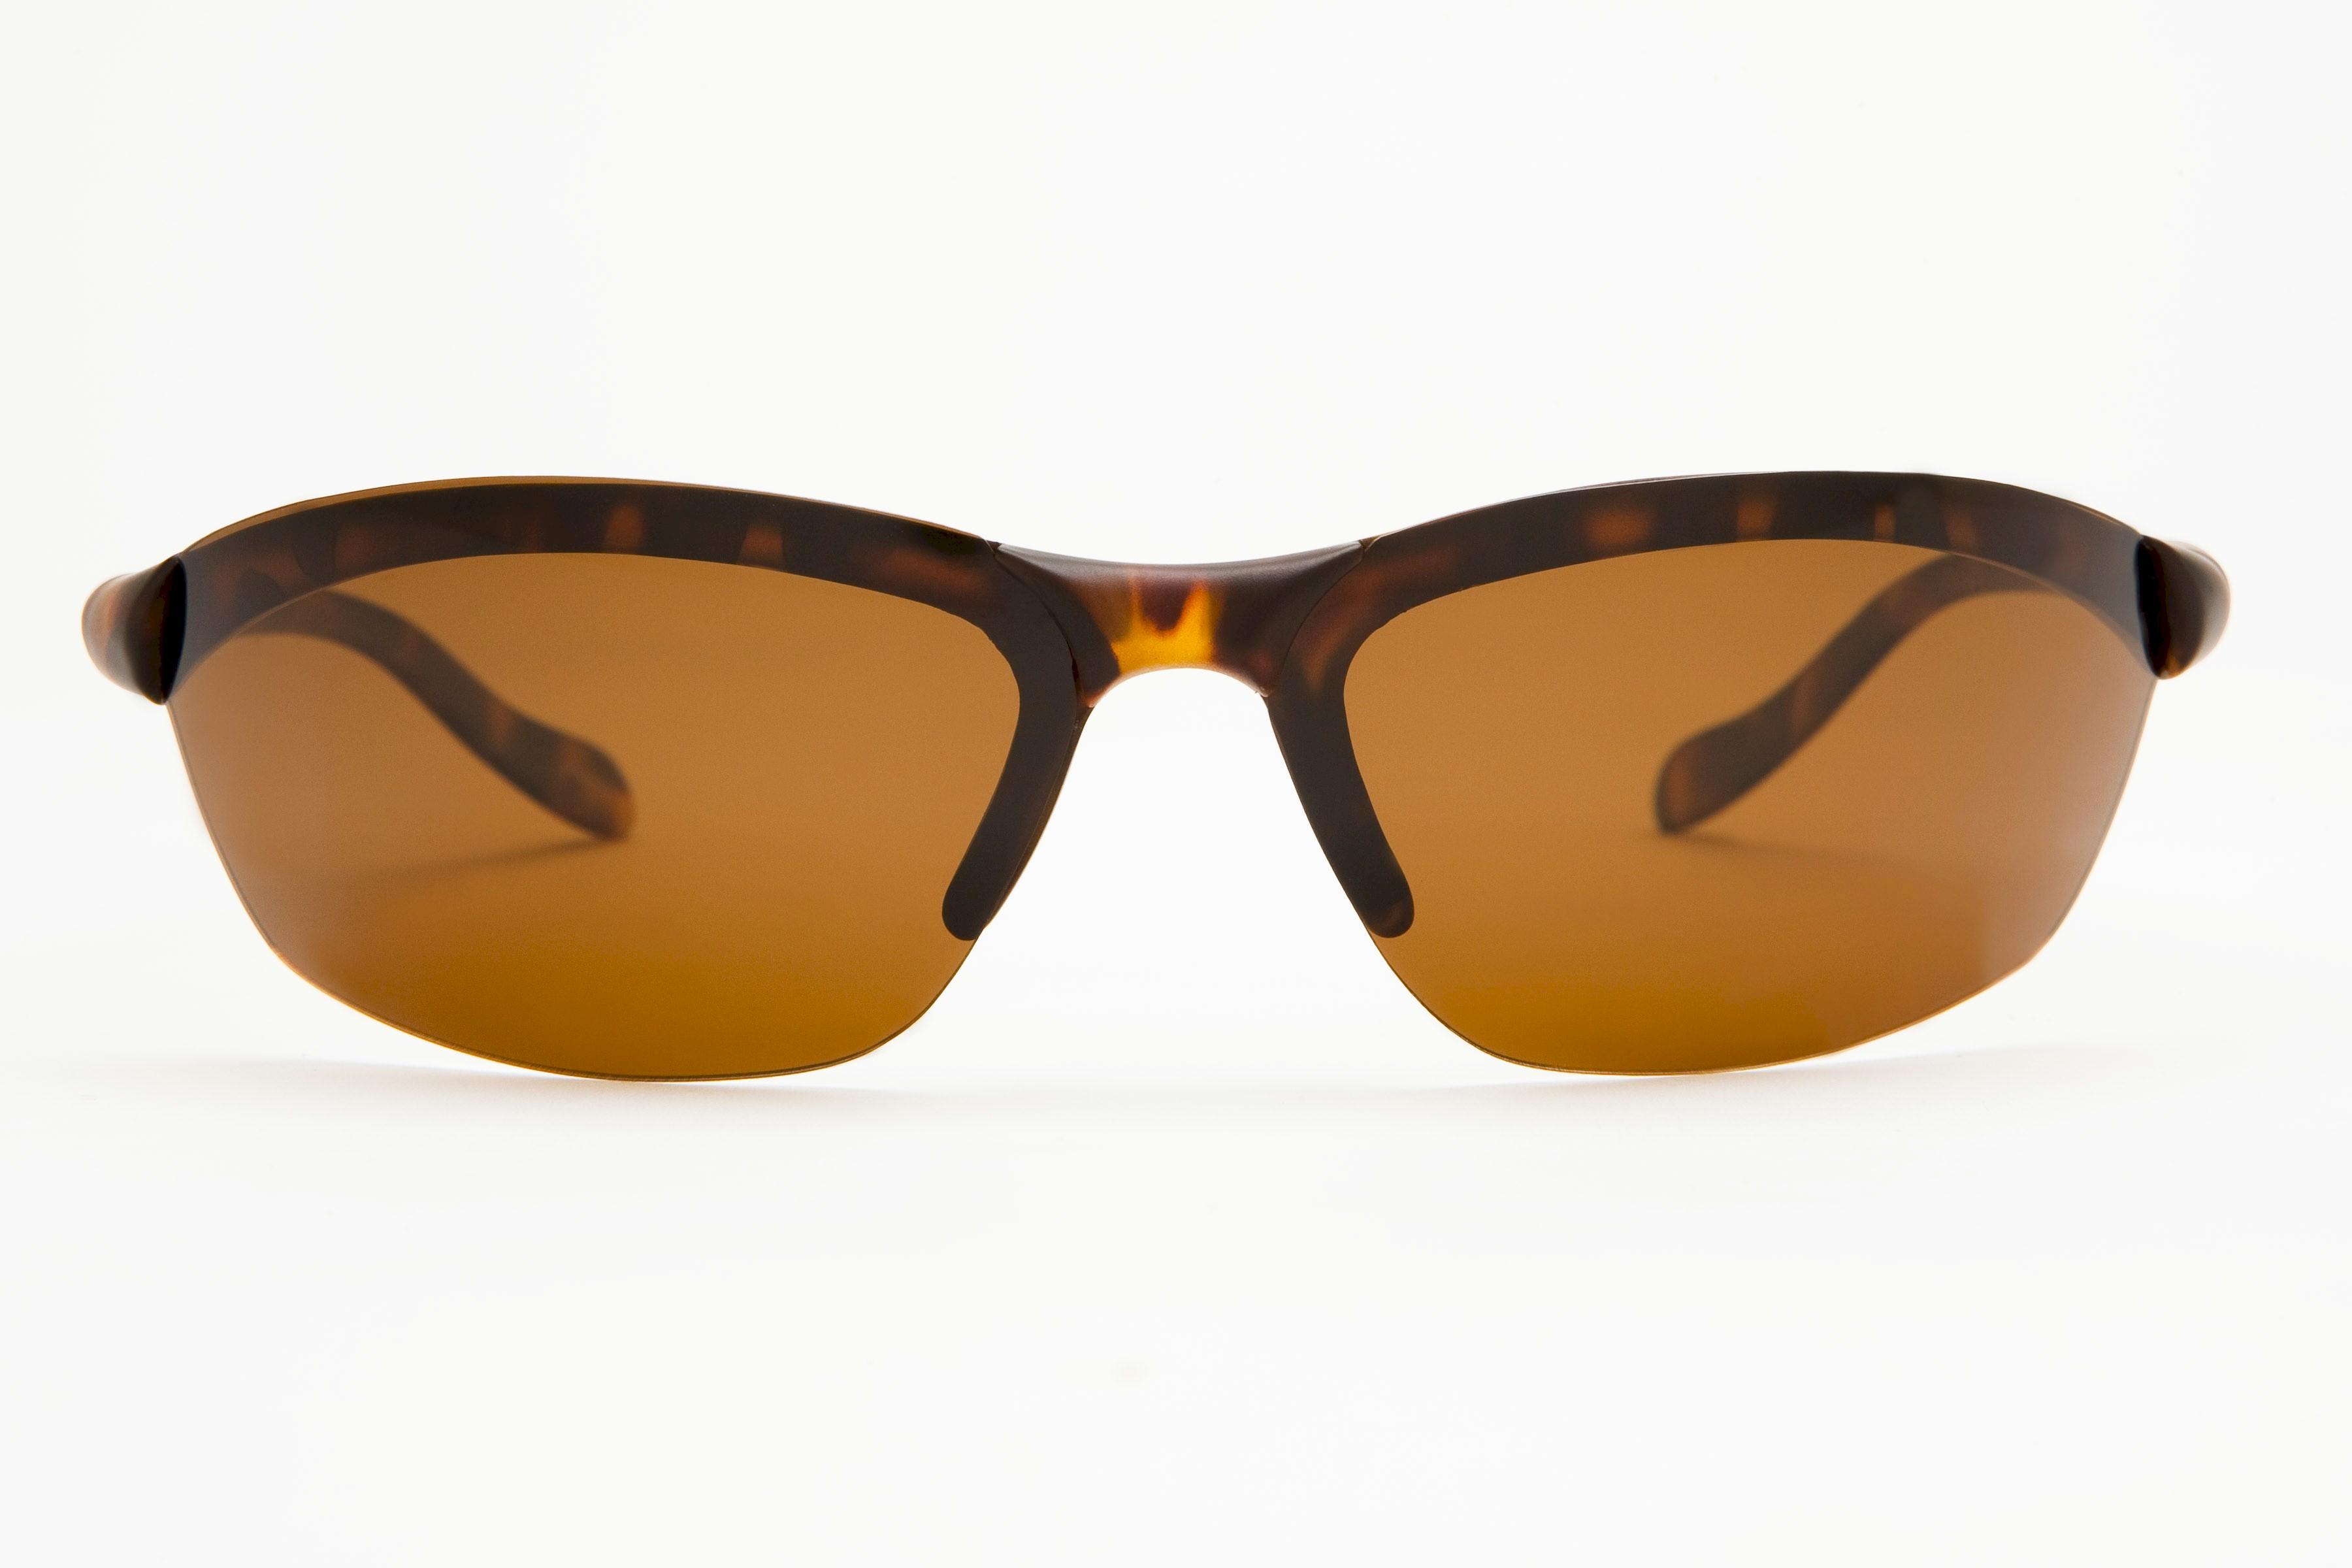 f5dd11dcd22 Native Sunglasses Dash SS Tiger s Eye Polarized Shades by Native